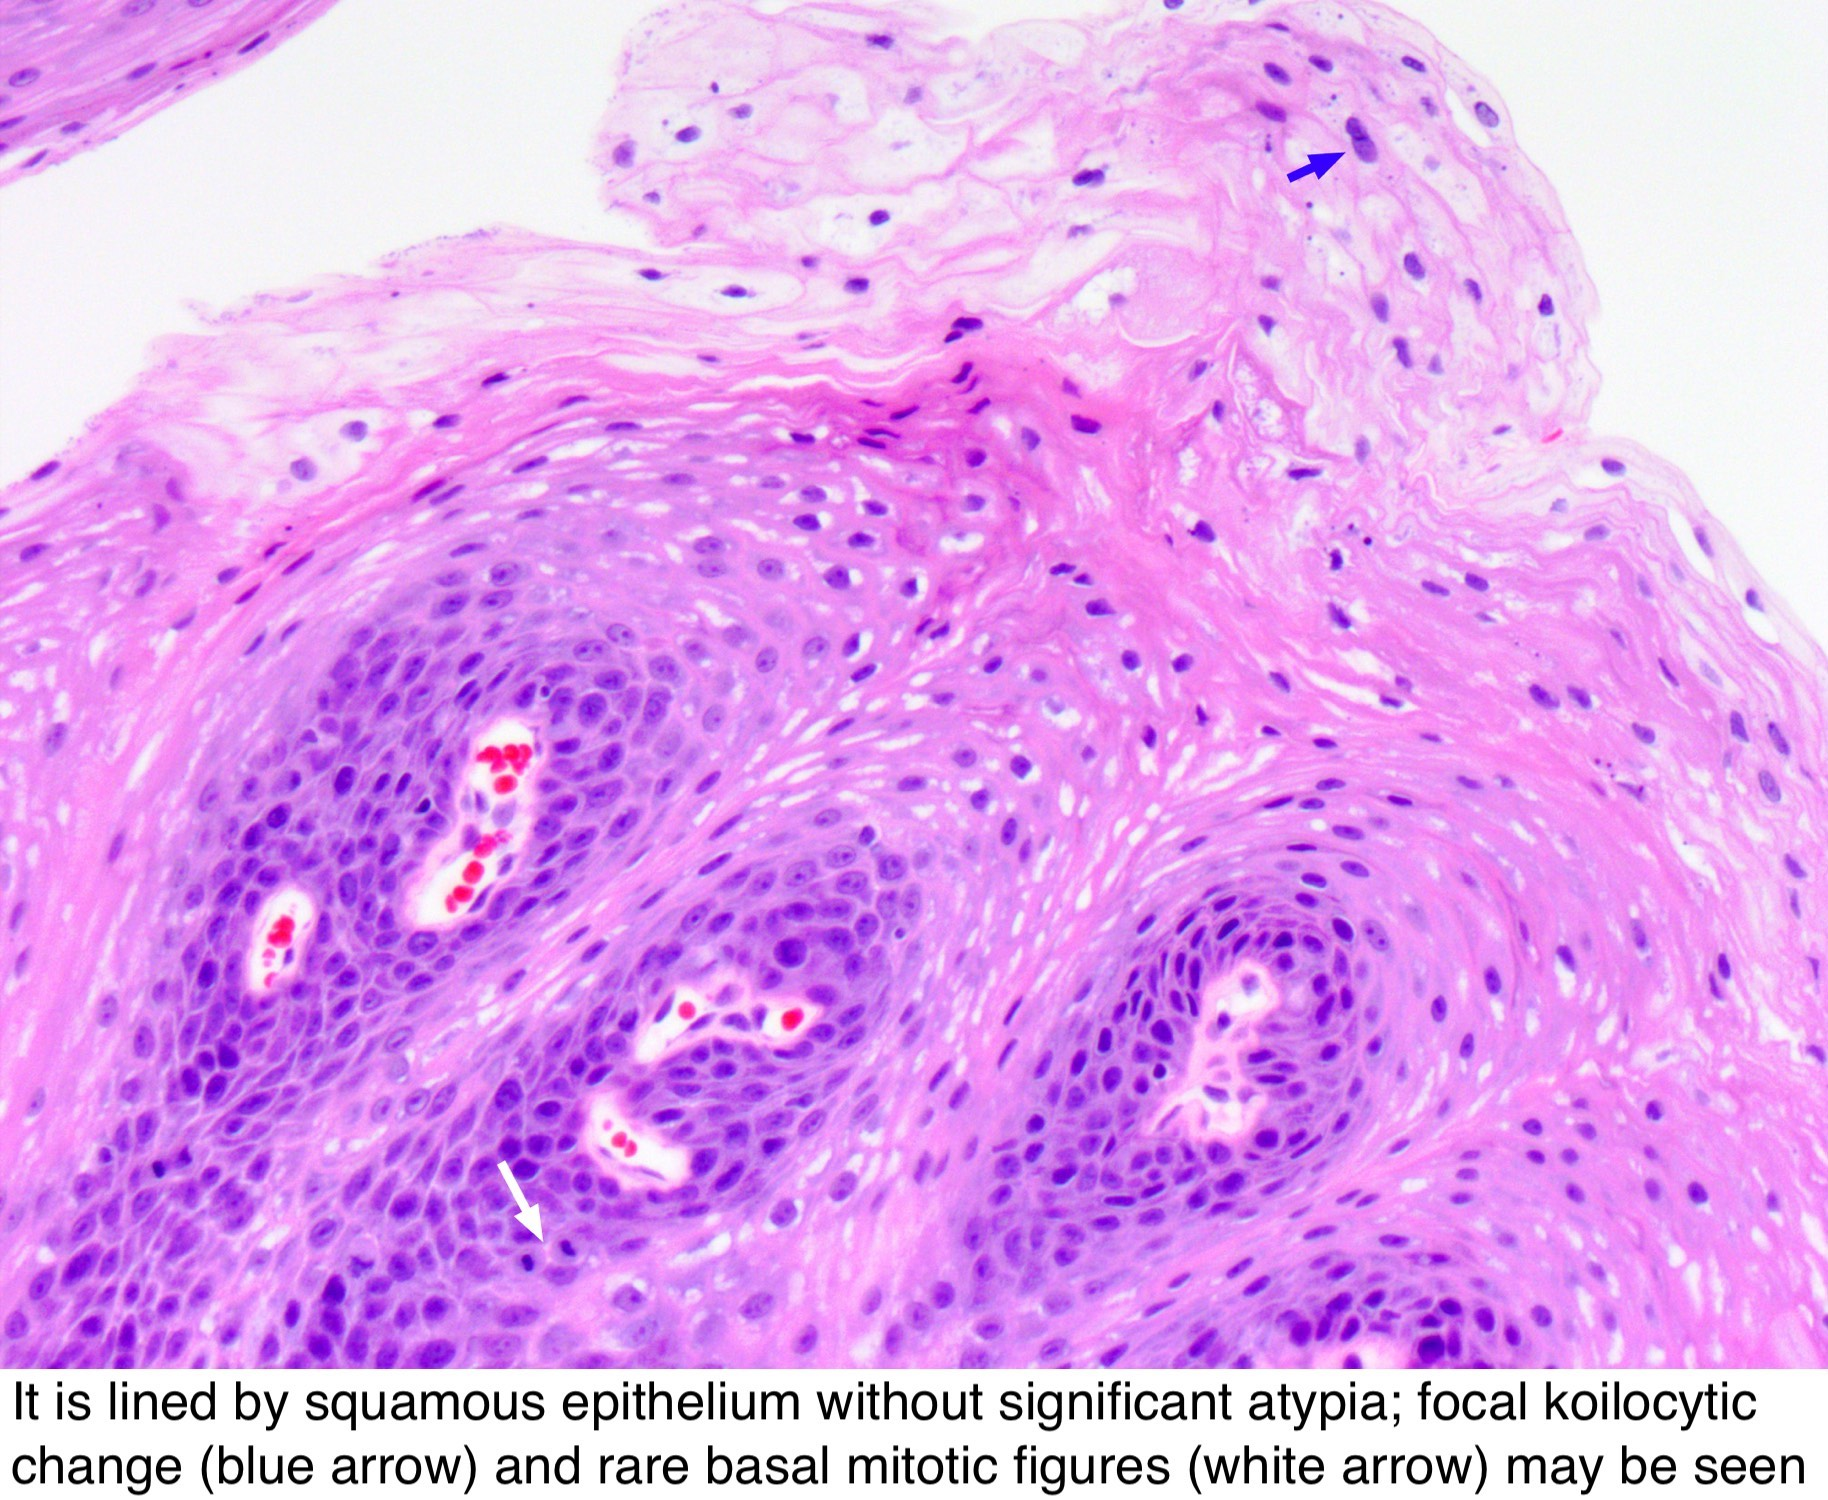 Sinonasal inverted papilloma icd 10, Icd 10 for inverted papilloma - vacante-insorite.ro